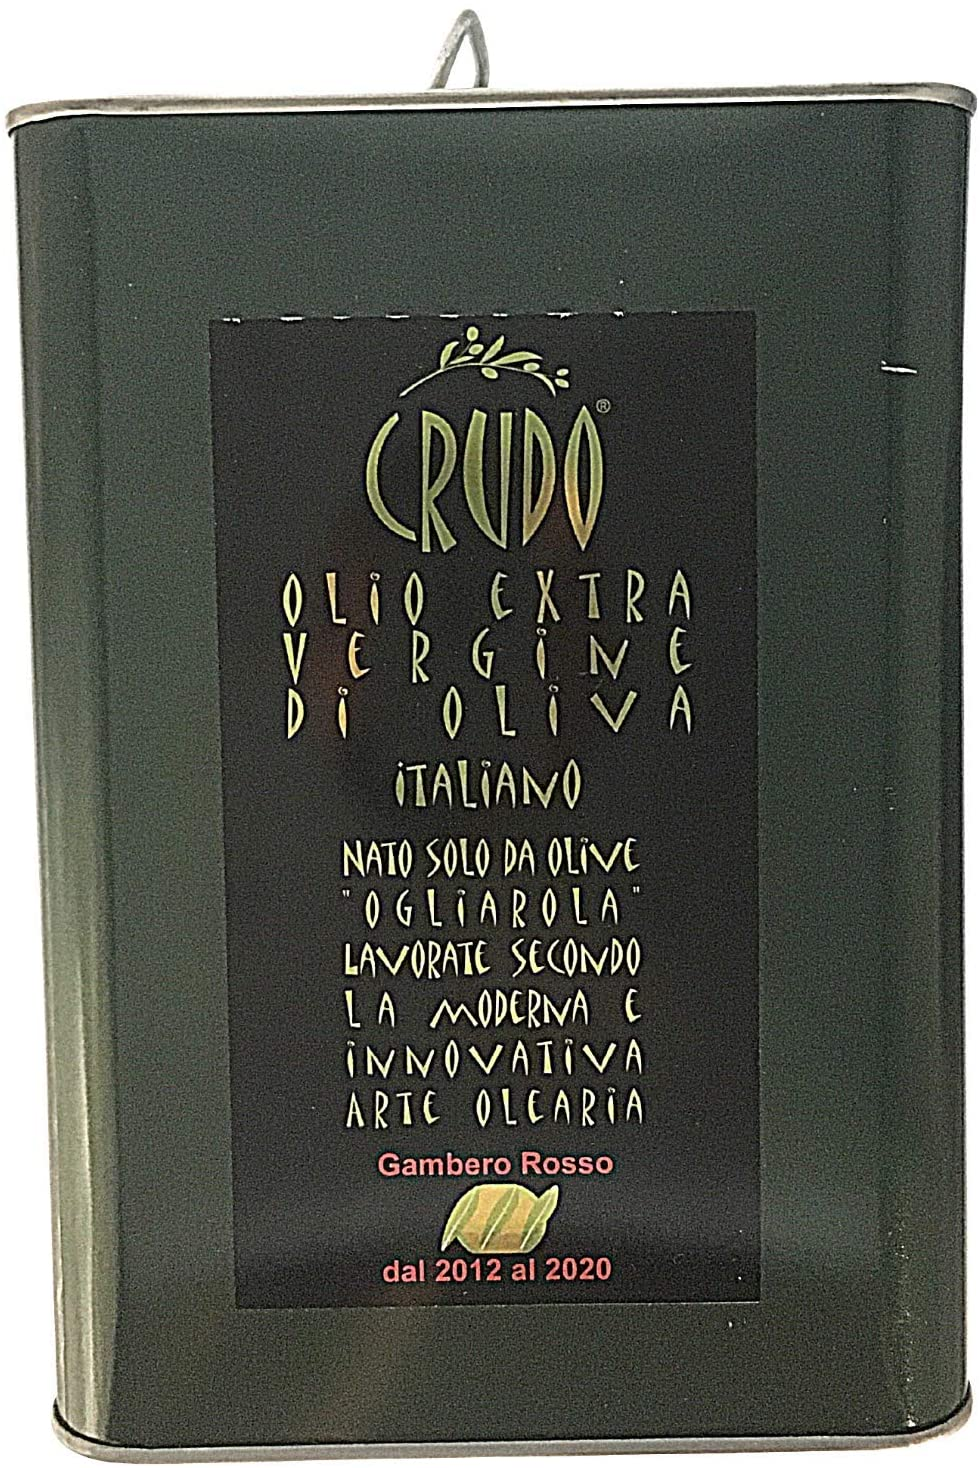 Schiralli, Olio extravergine di Oliva Italiano Crudo – Olive 100% Monocultivar Ogliarola Pugliese – Raccolto 2020 – Olio EVO ott